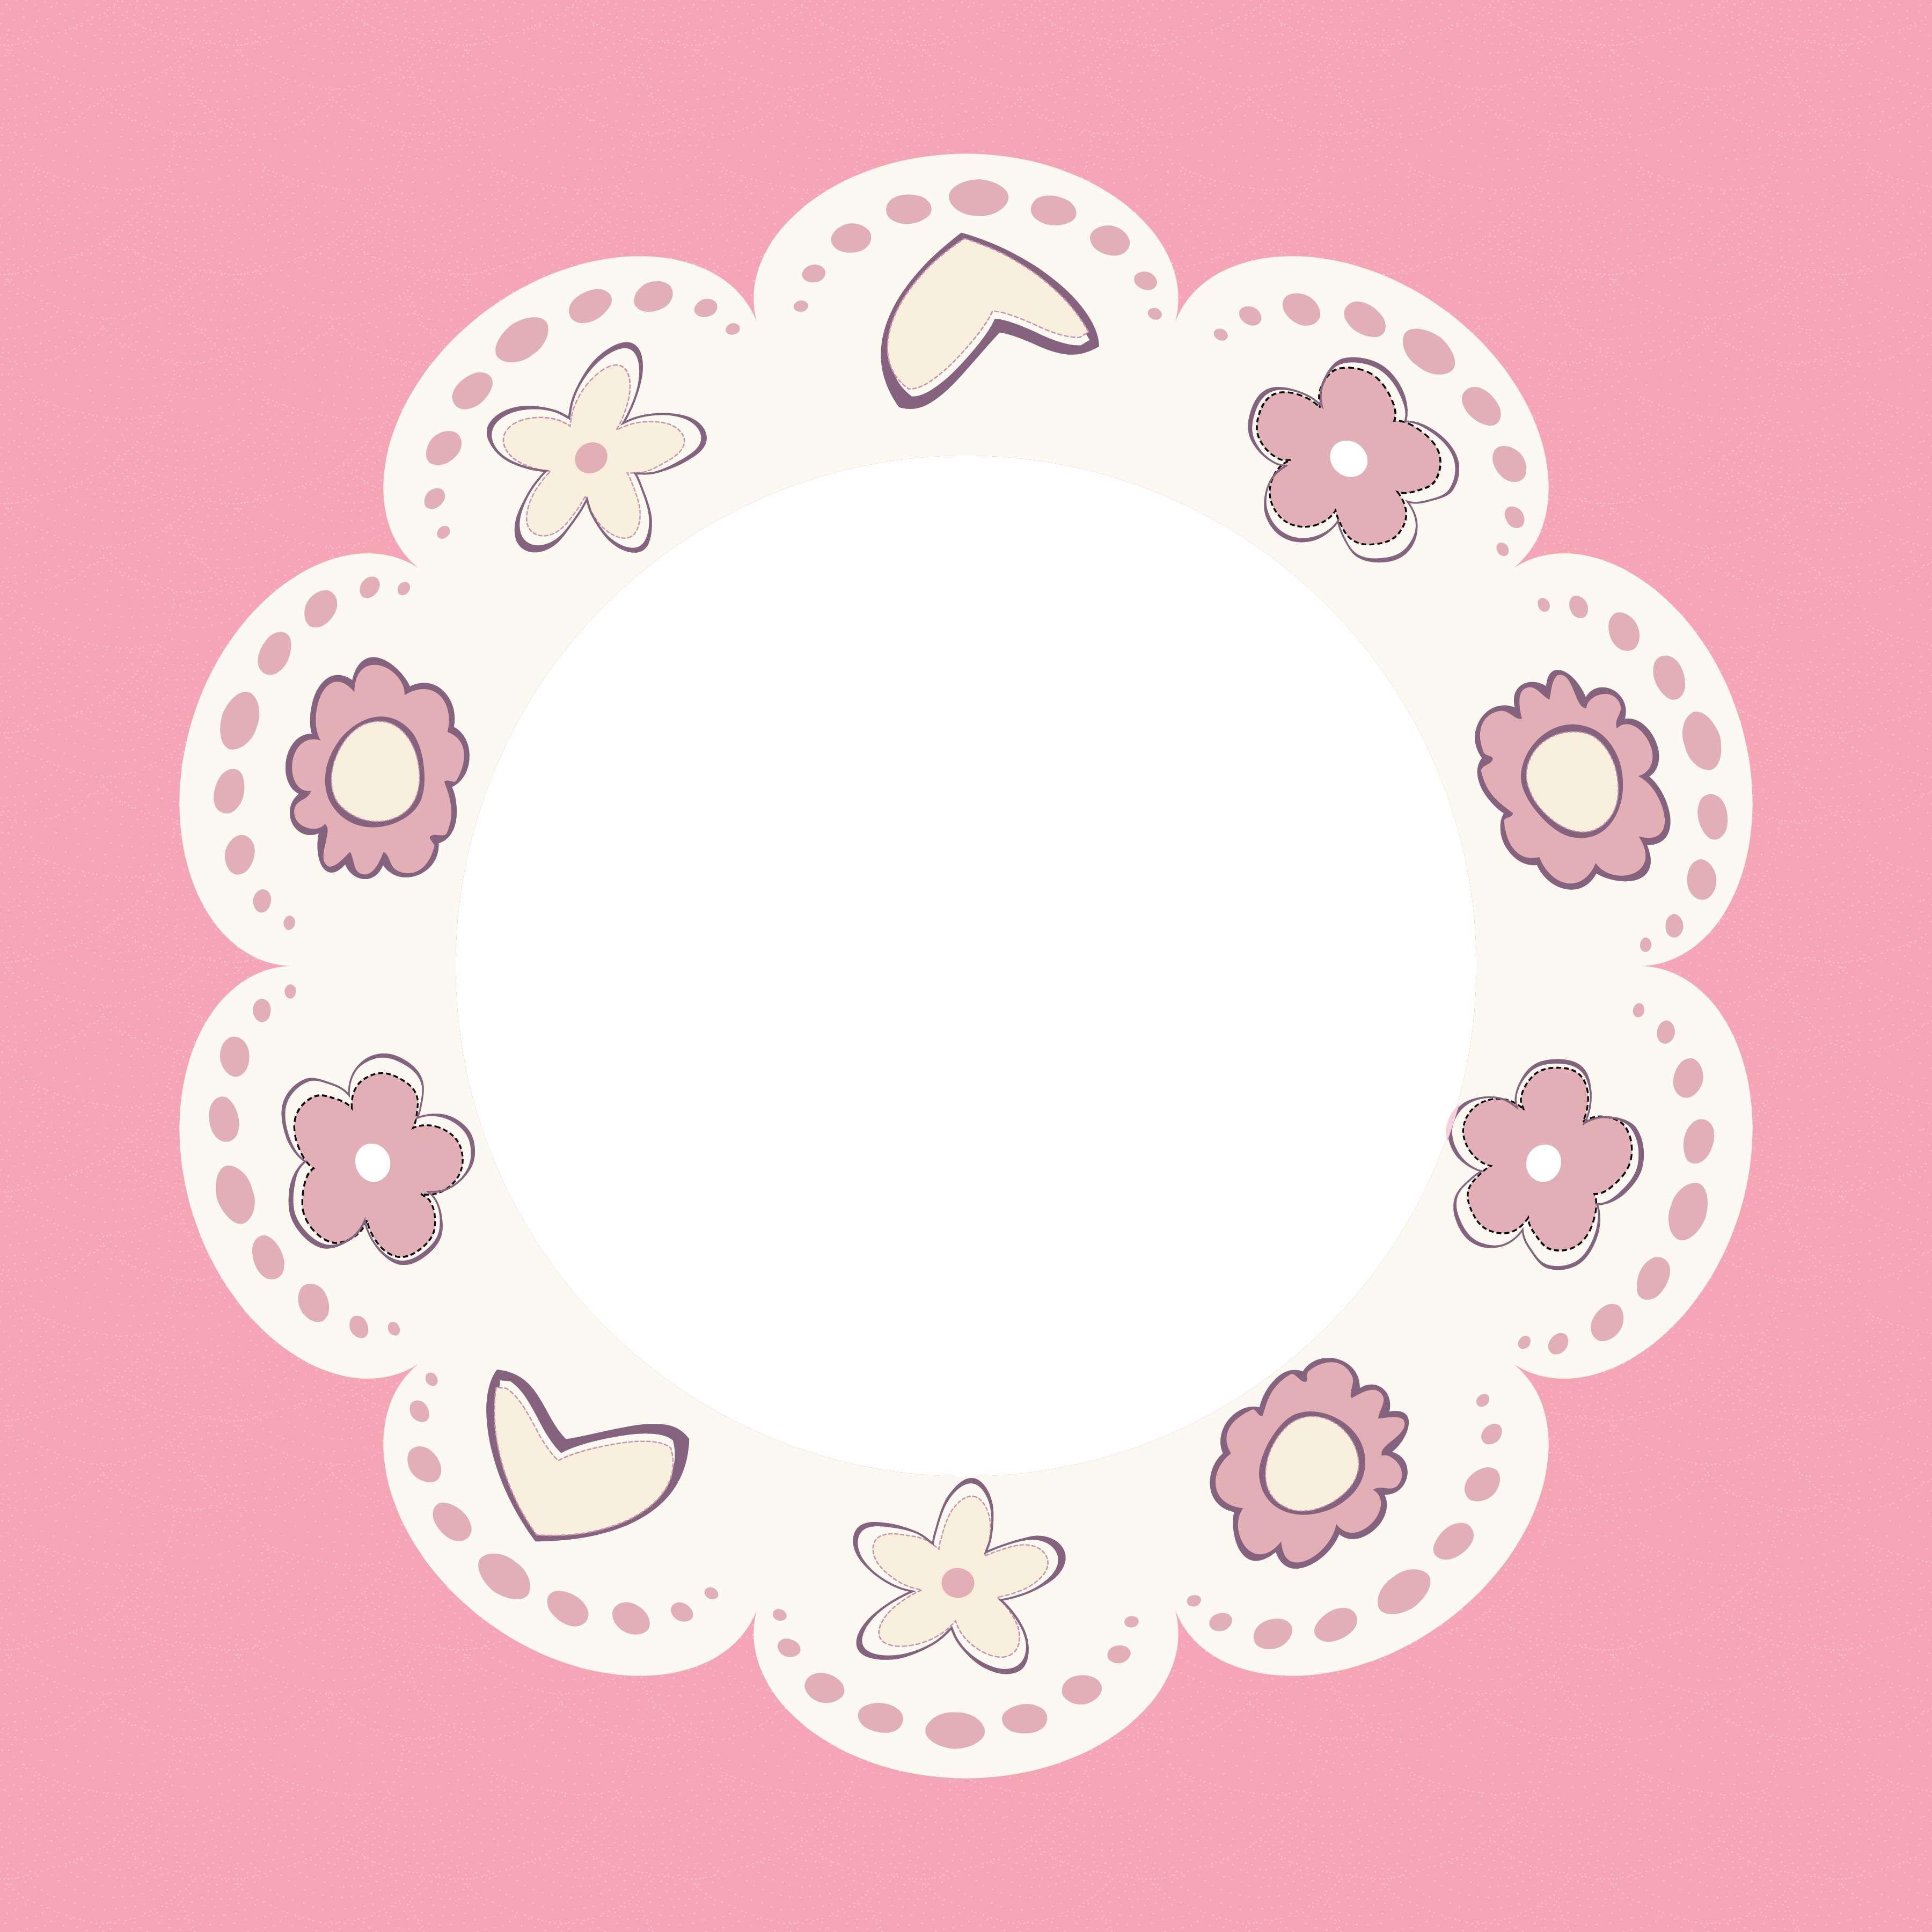 baby girl #baby girl photo book template #baby girl photo frame ...